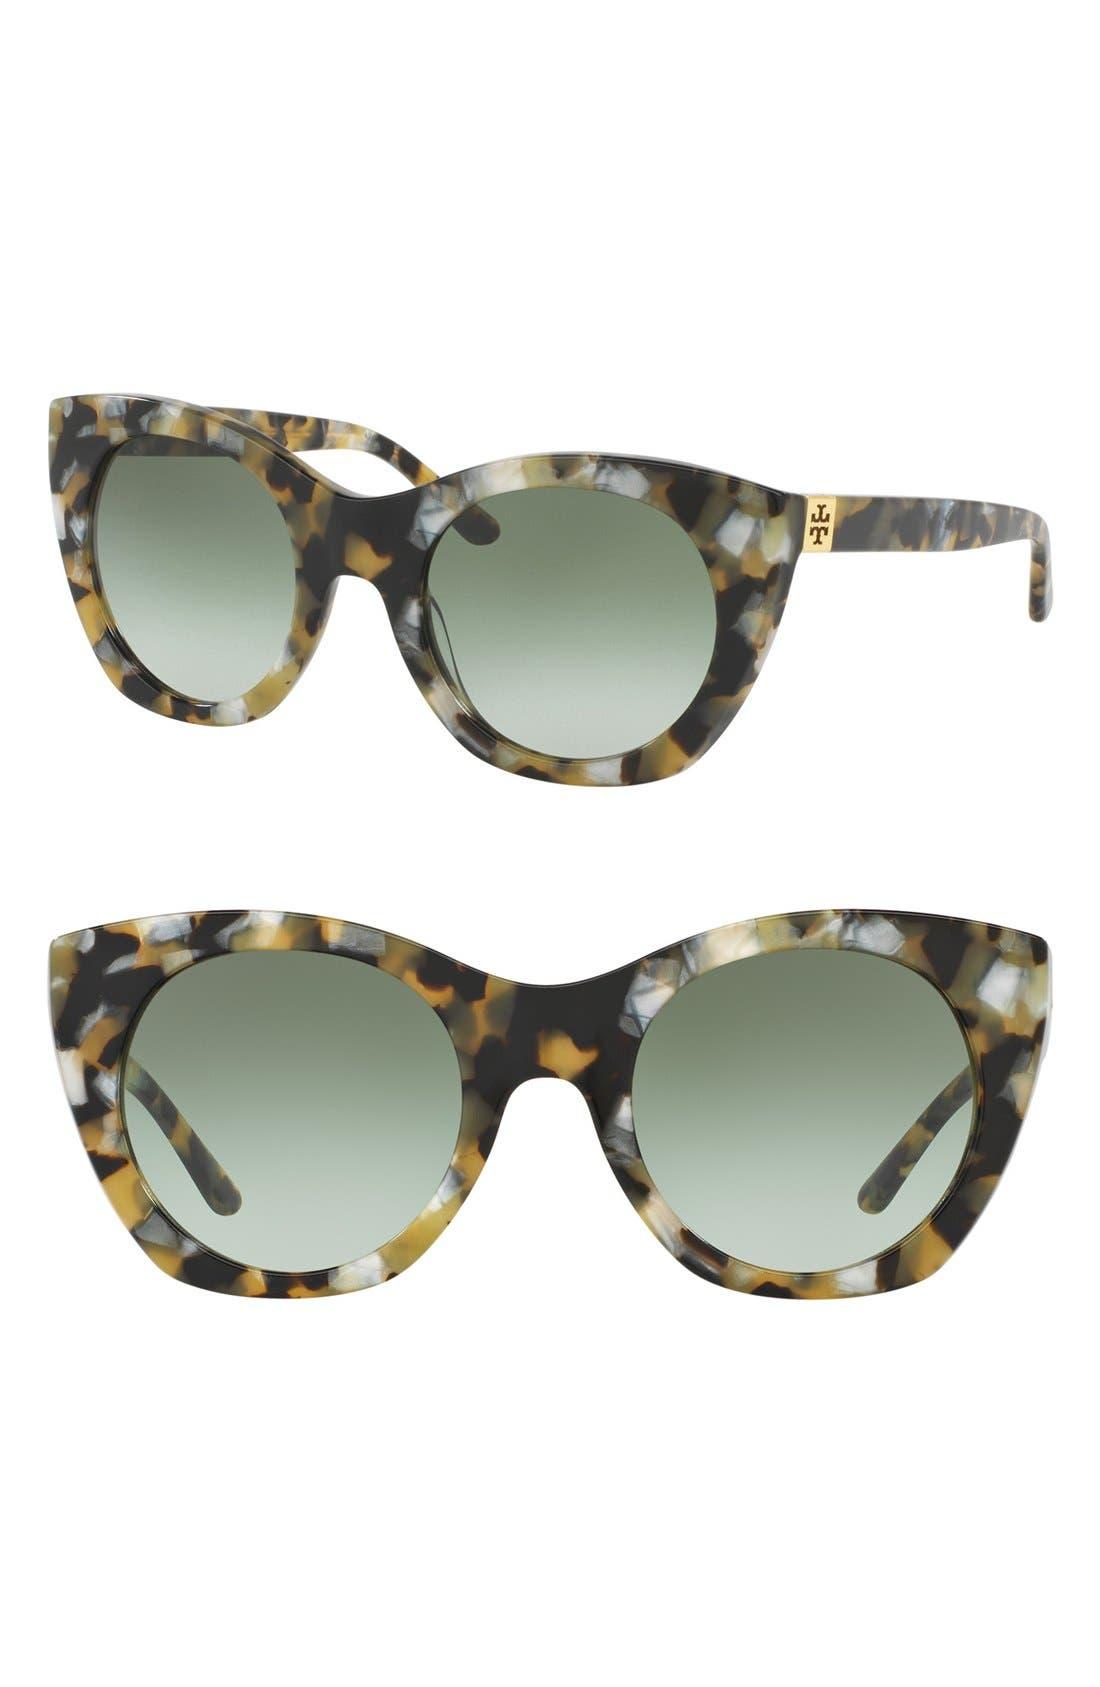 Main Image - Tory Burch 52mm Cat Eye Sunglasses